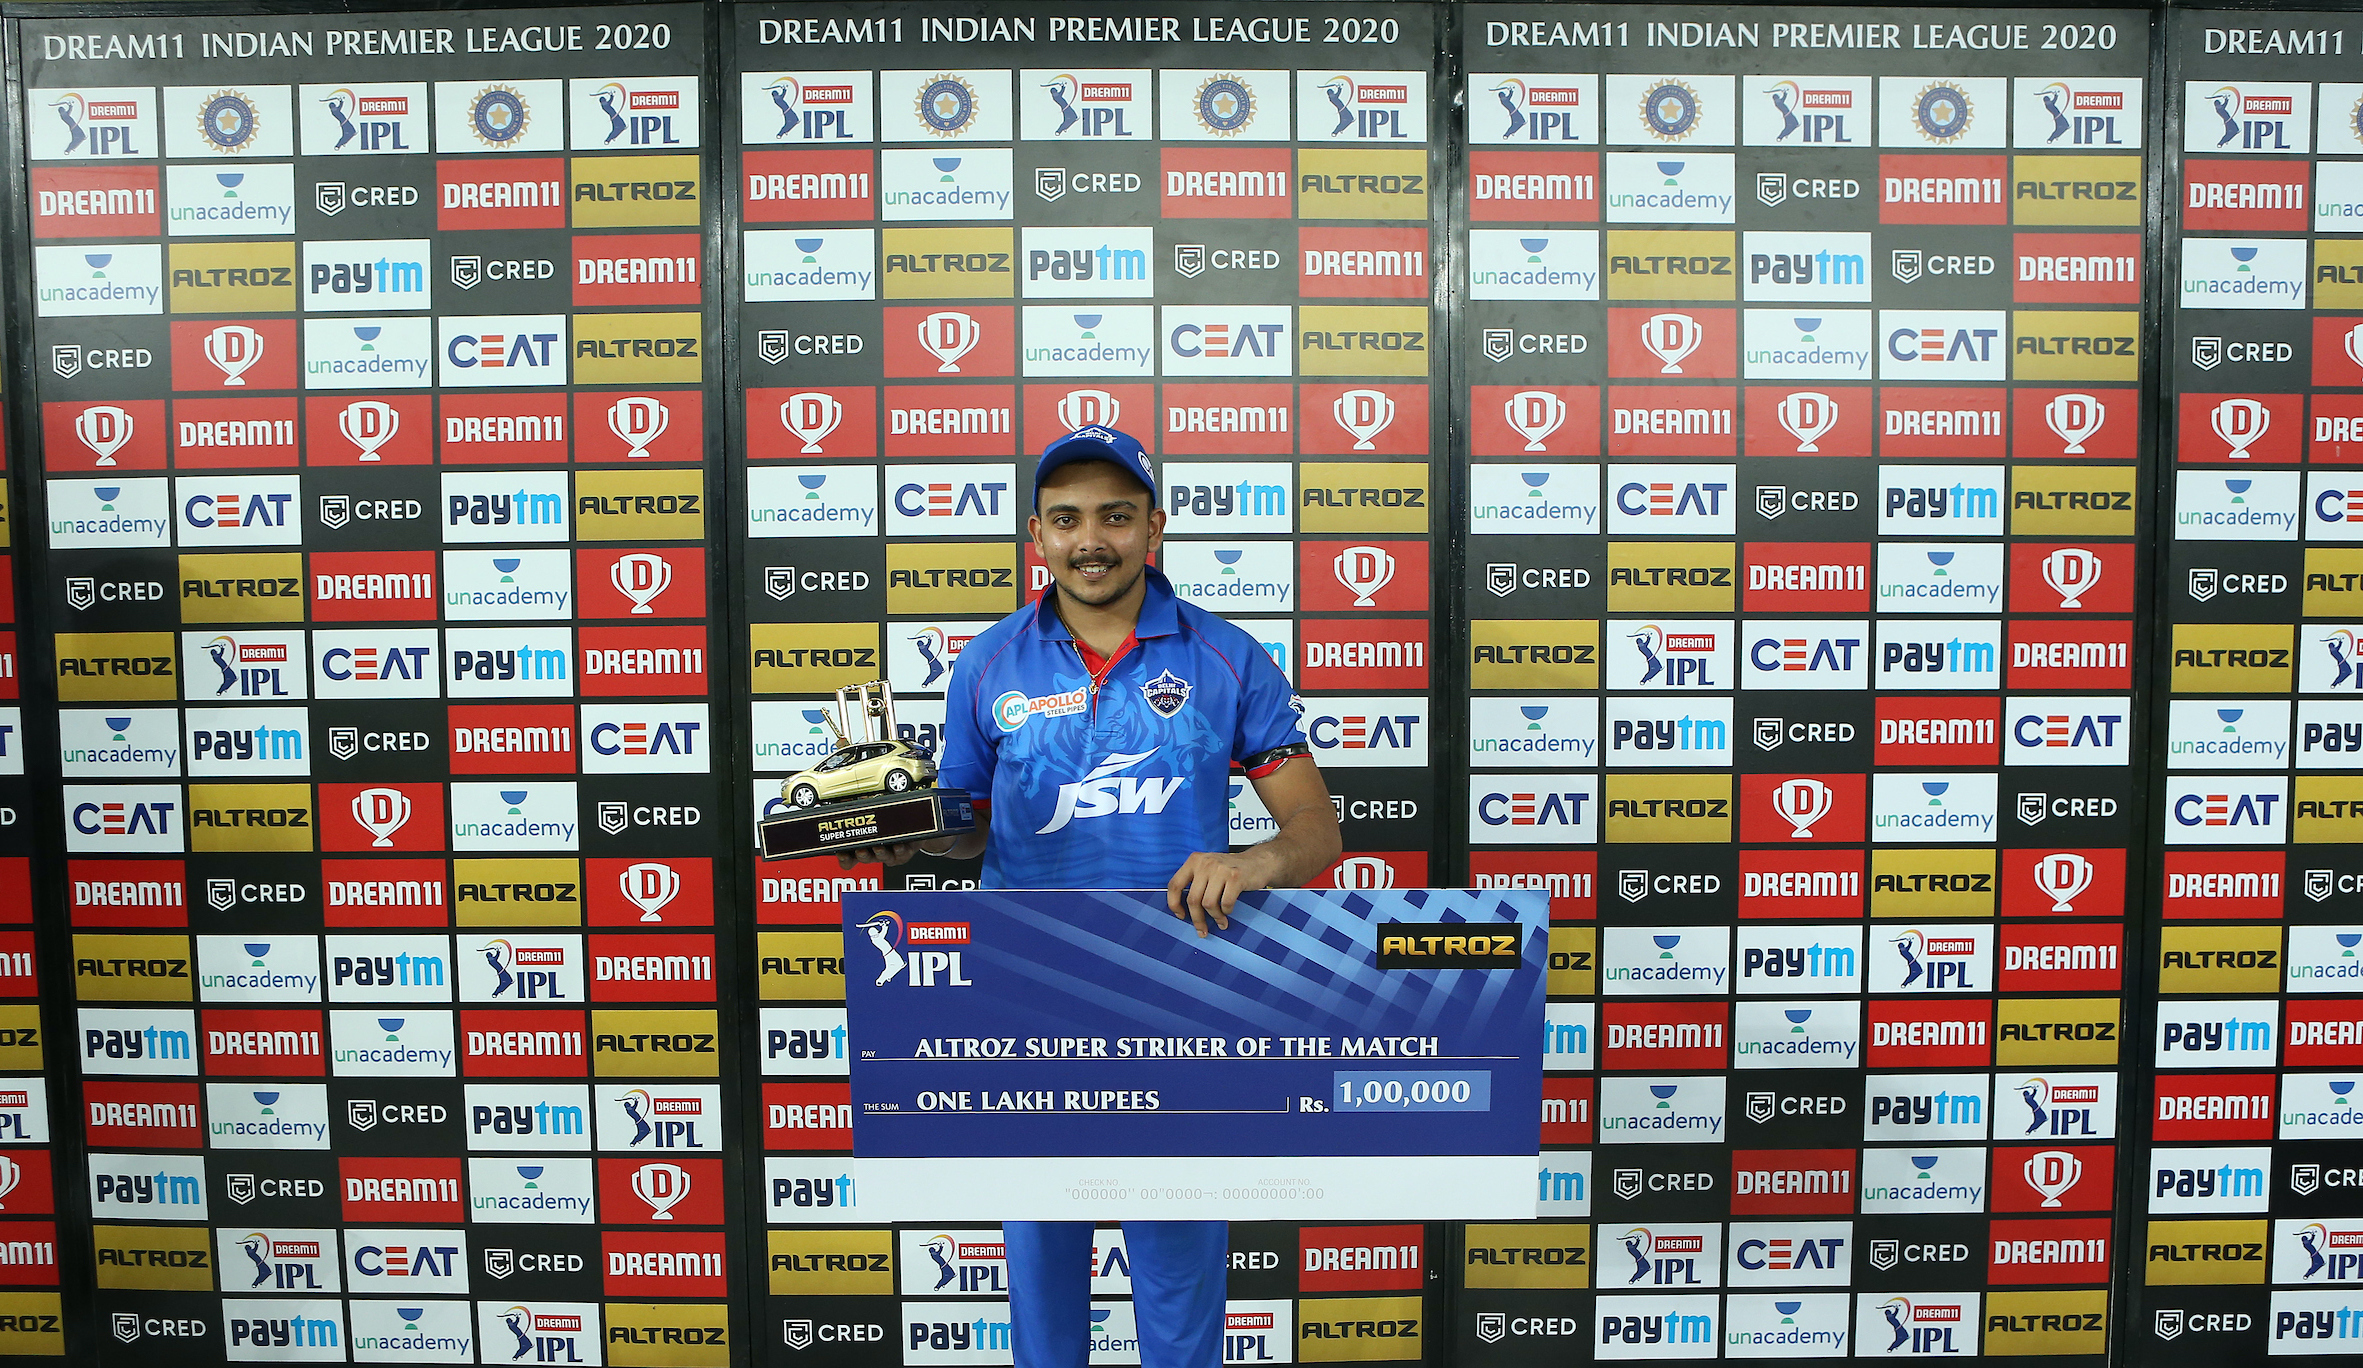 IPL 2020 CSK vs DC: Delhi Capitals beat Chennai Super Kings by 44 runs & jump to top spot in the table